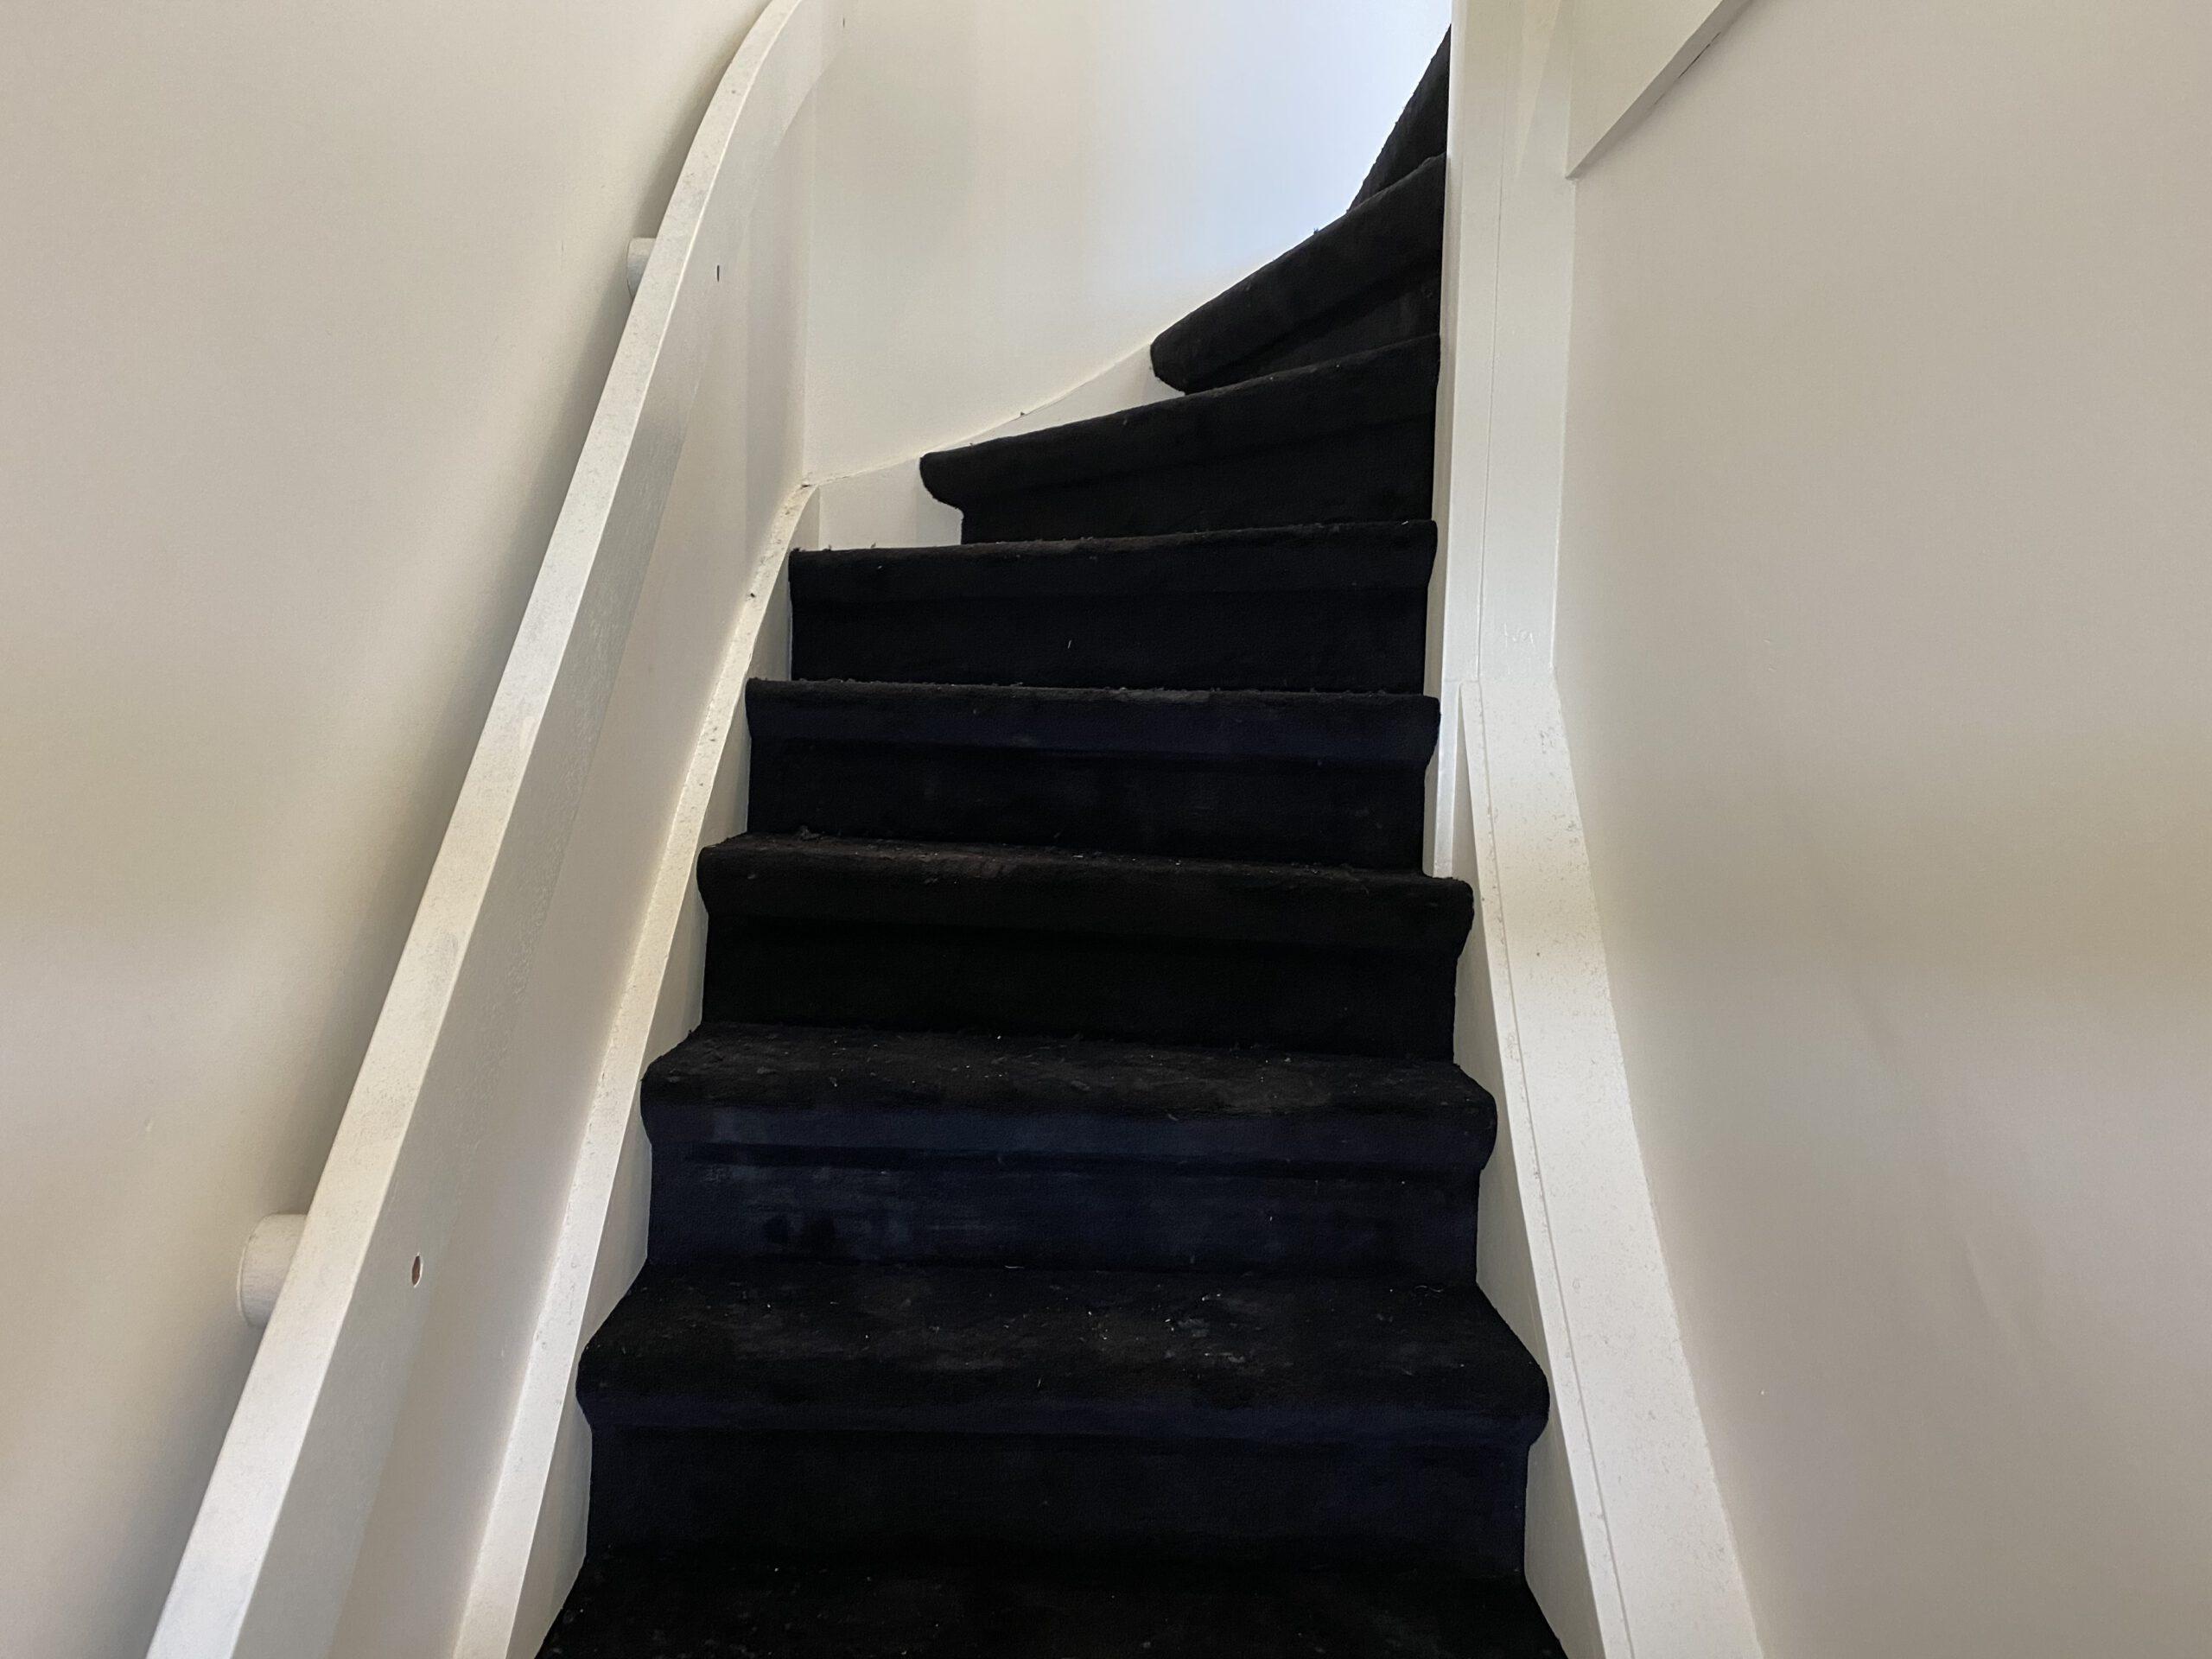 Bacovloeren trap en hal renovatie 3